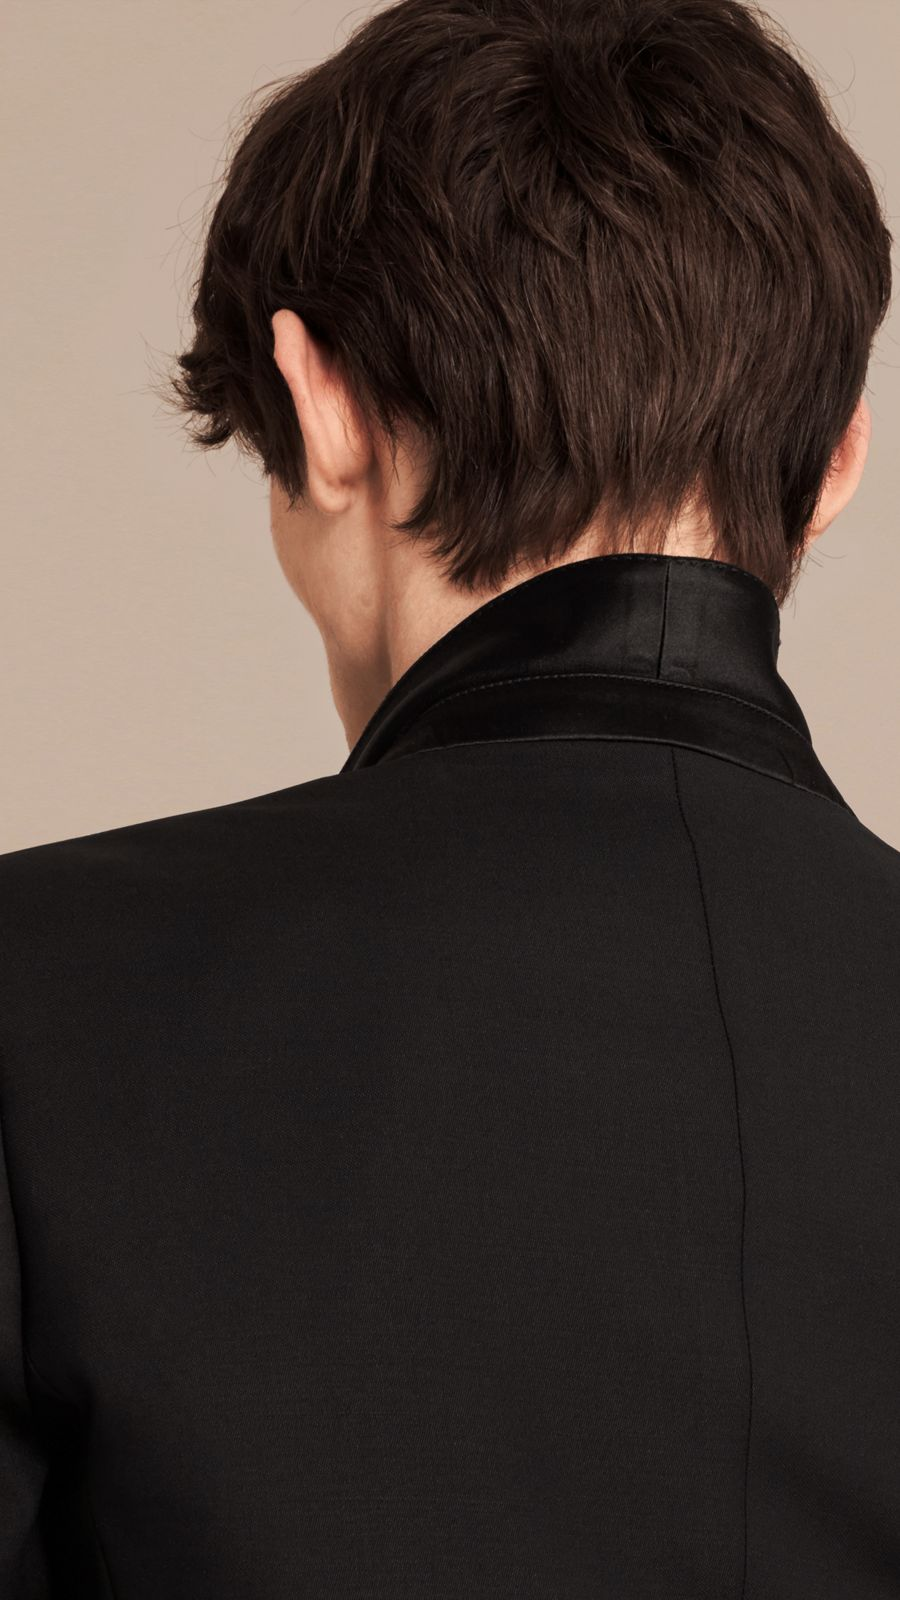 Black Slim Fit Wool Mohair Half-canvas Tuxedo - Image 6